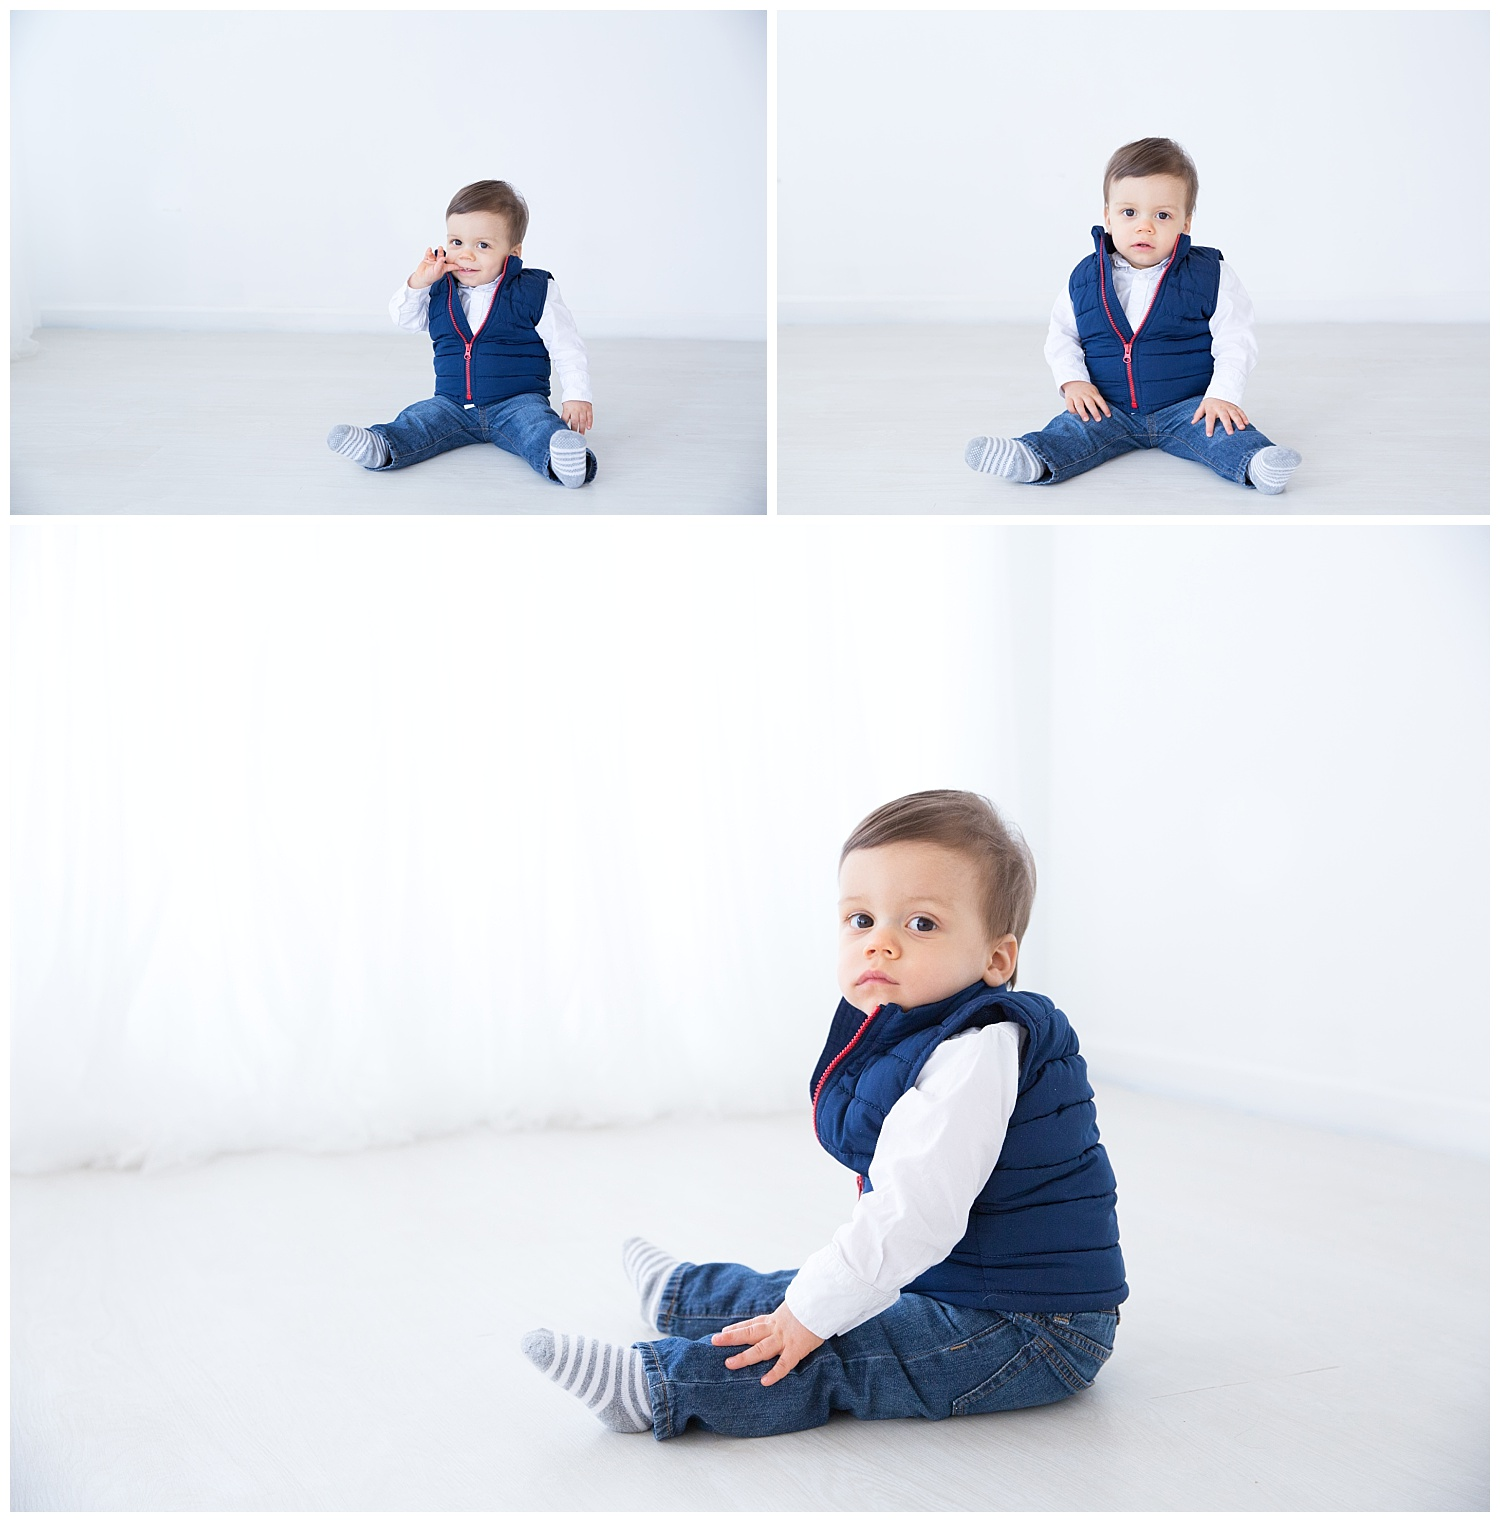 little boy on his first birthday wearing a dark blue jacket in burlington nj